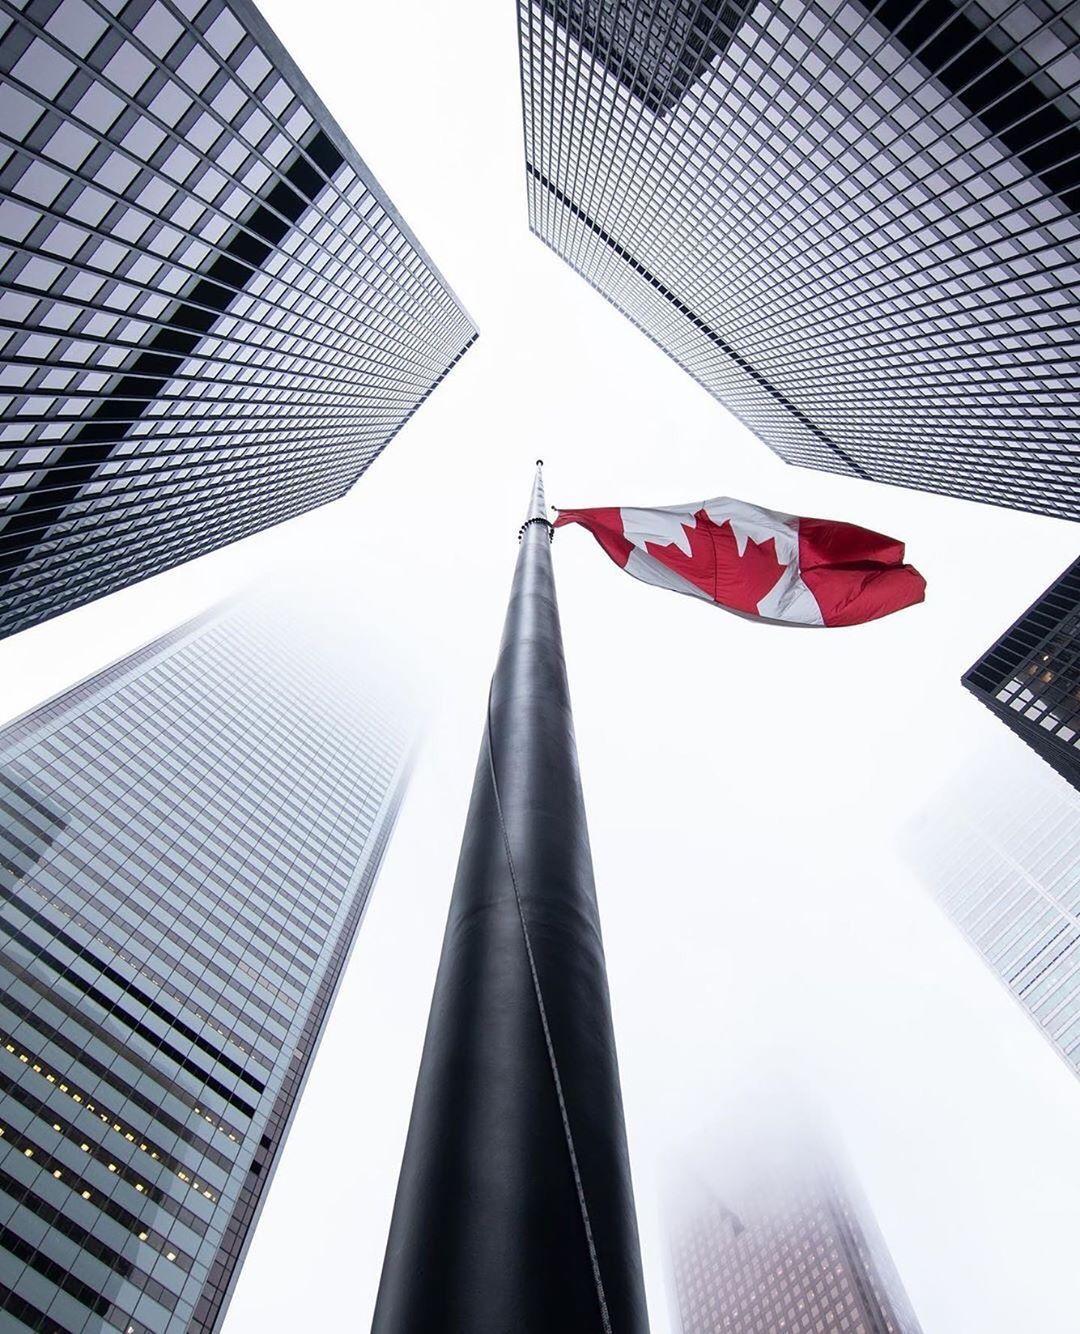 "blogTO's Instagram profile post: ""Stay strong, Canada 🇨🇦 #Toronto #Ontario #Canada #CanadianFlag #ourcommunityTO - 📸 @jgazze"""